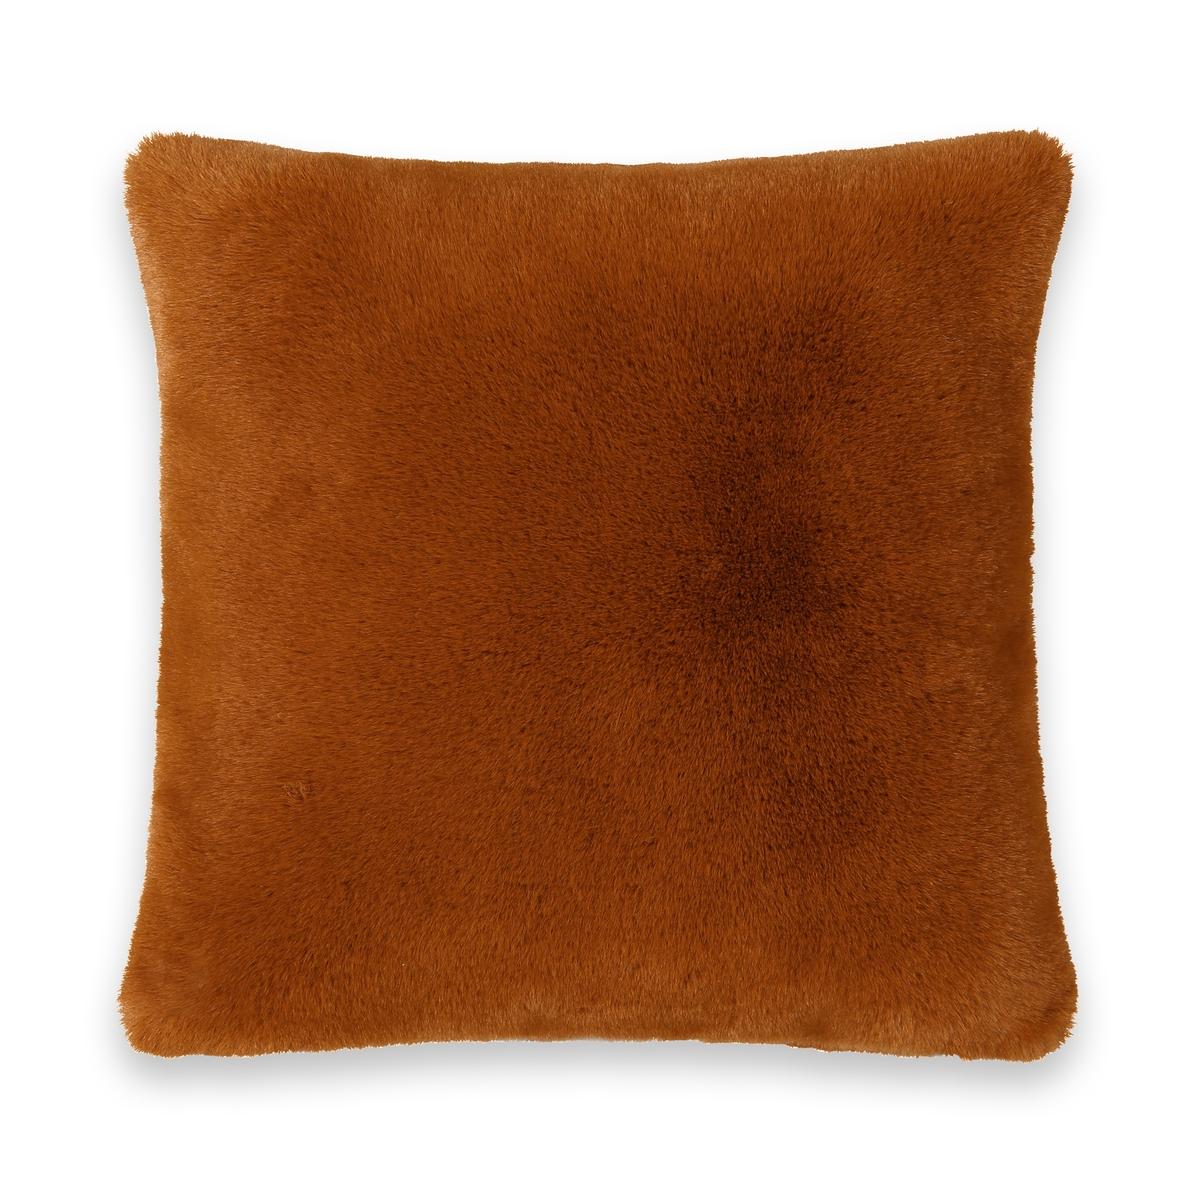 Чехол La Redoute На подушку из искусственного меха Noursi 40 x 40 см каштановый чехол навололчка la redoute aeri 40 x 40 см бежевый